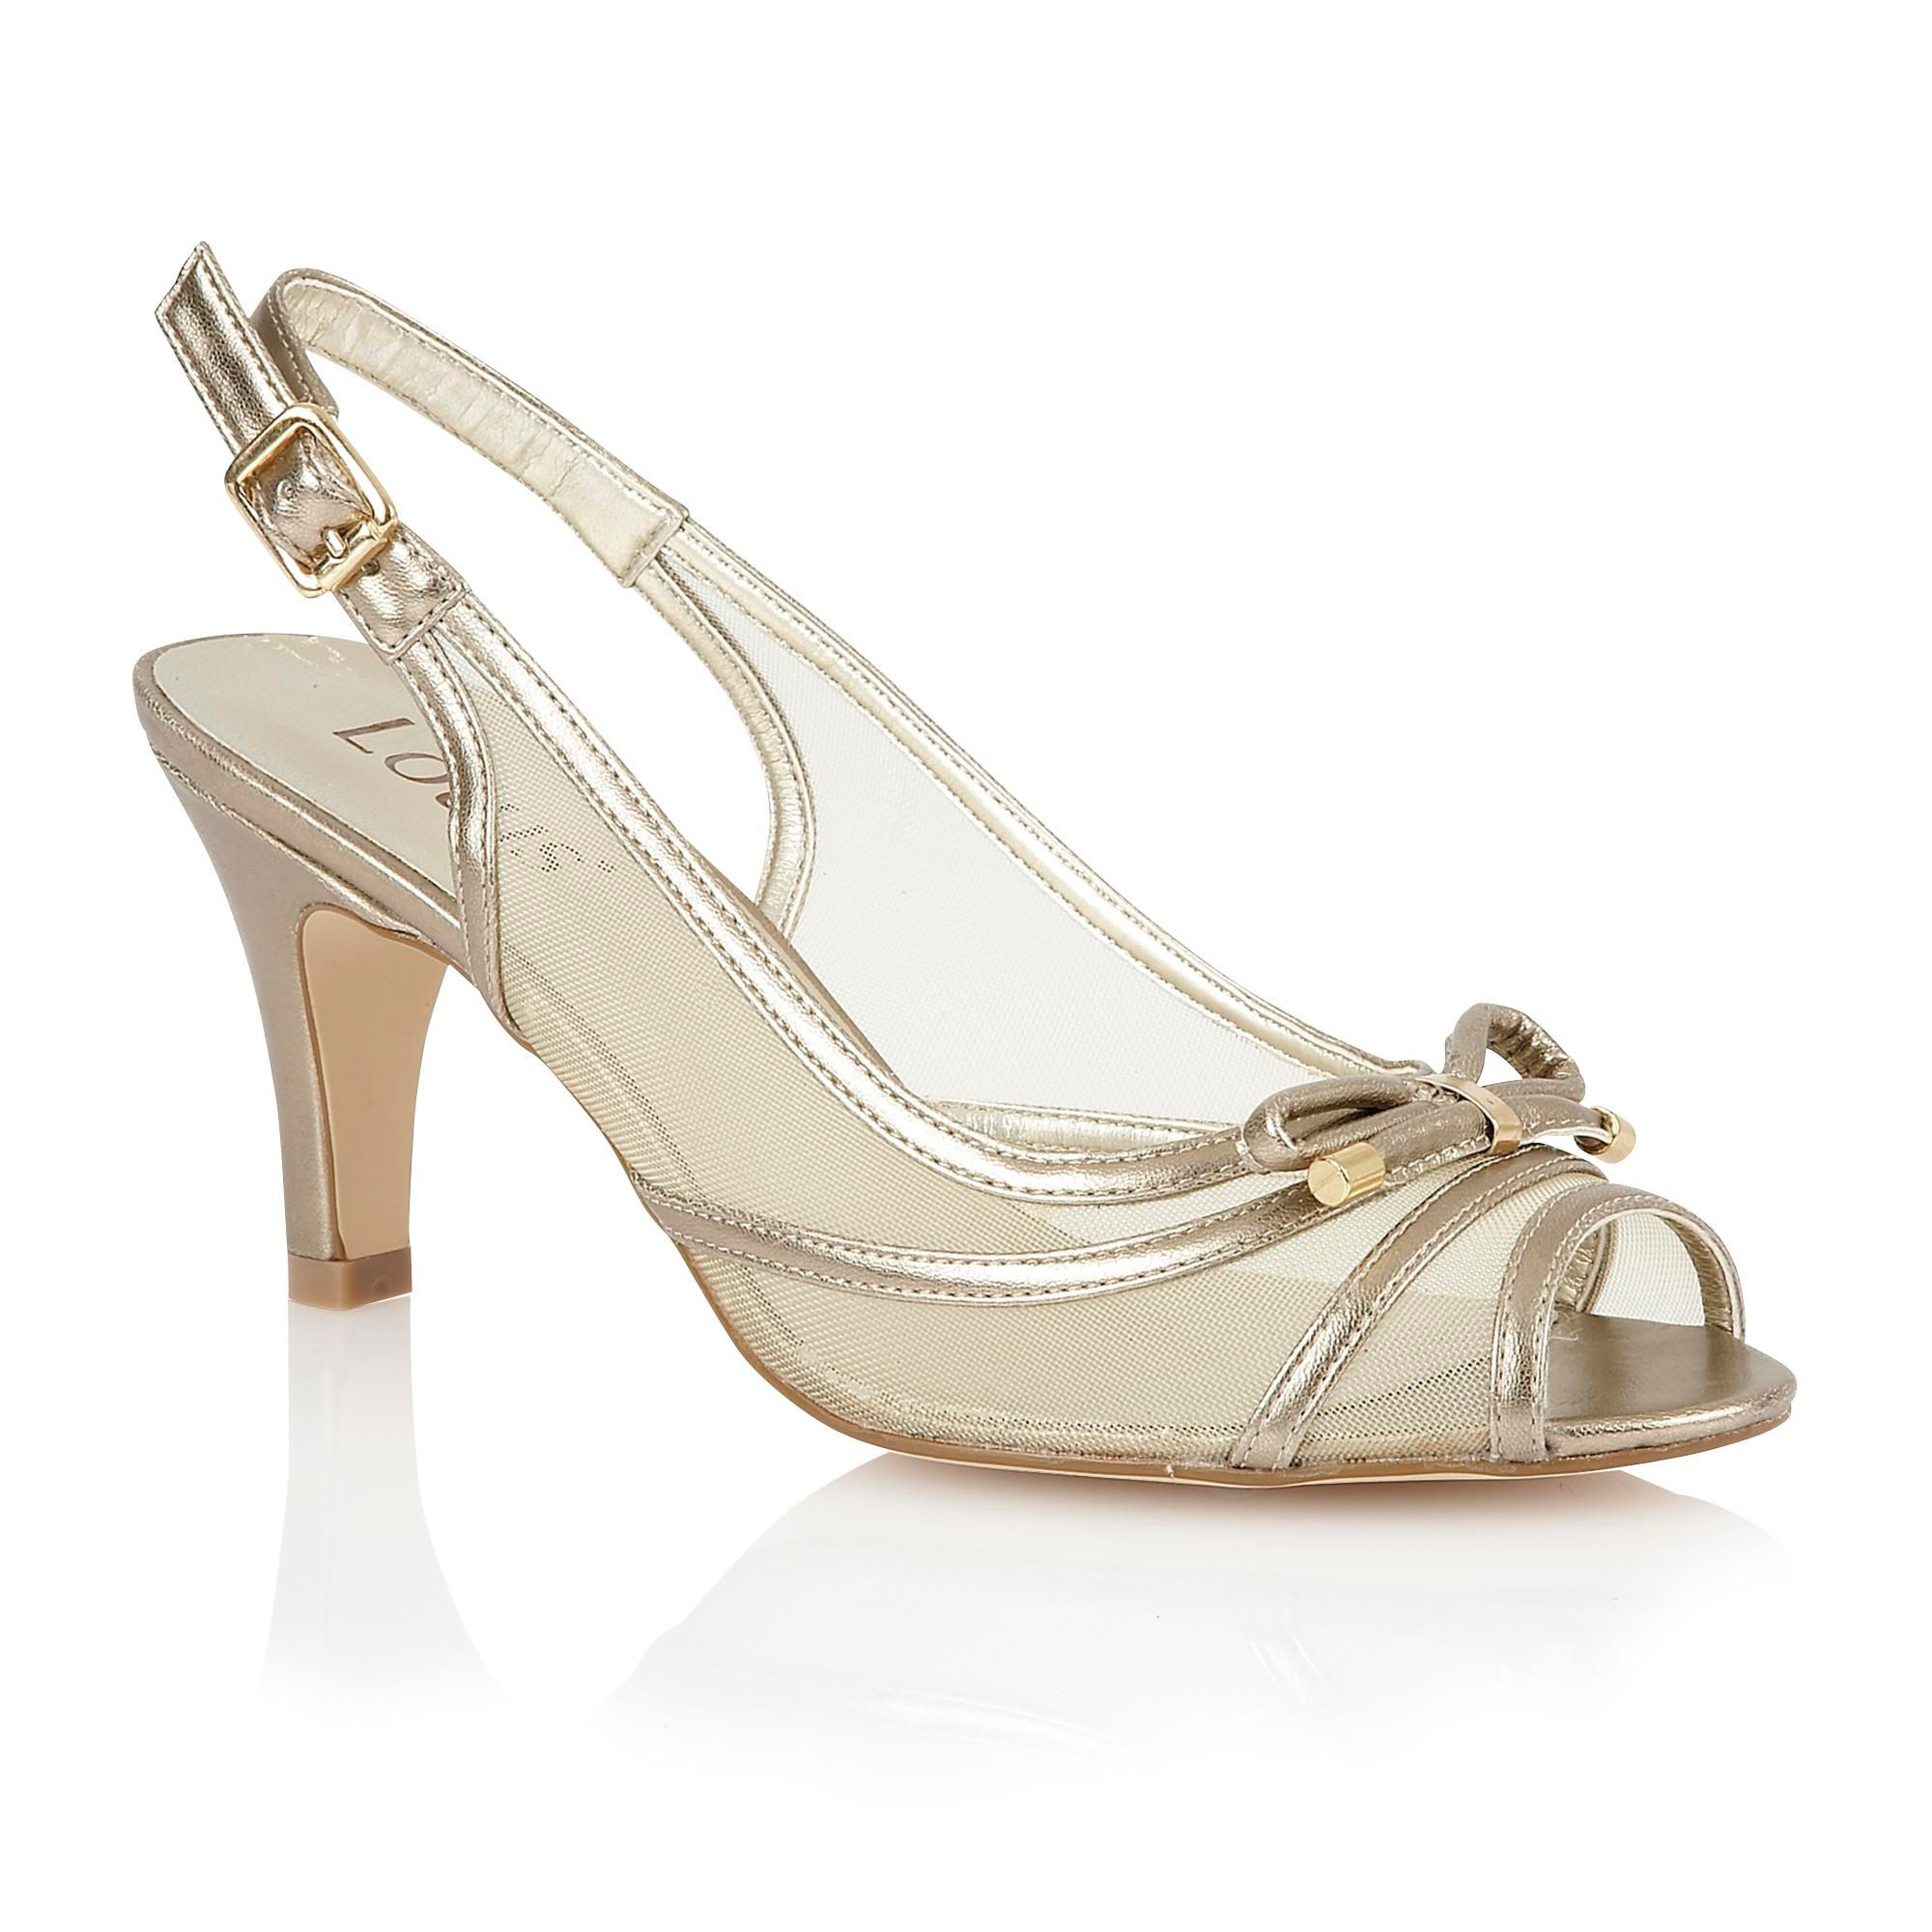 Jessica Simpson Sizing Shoes